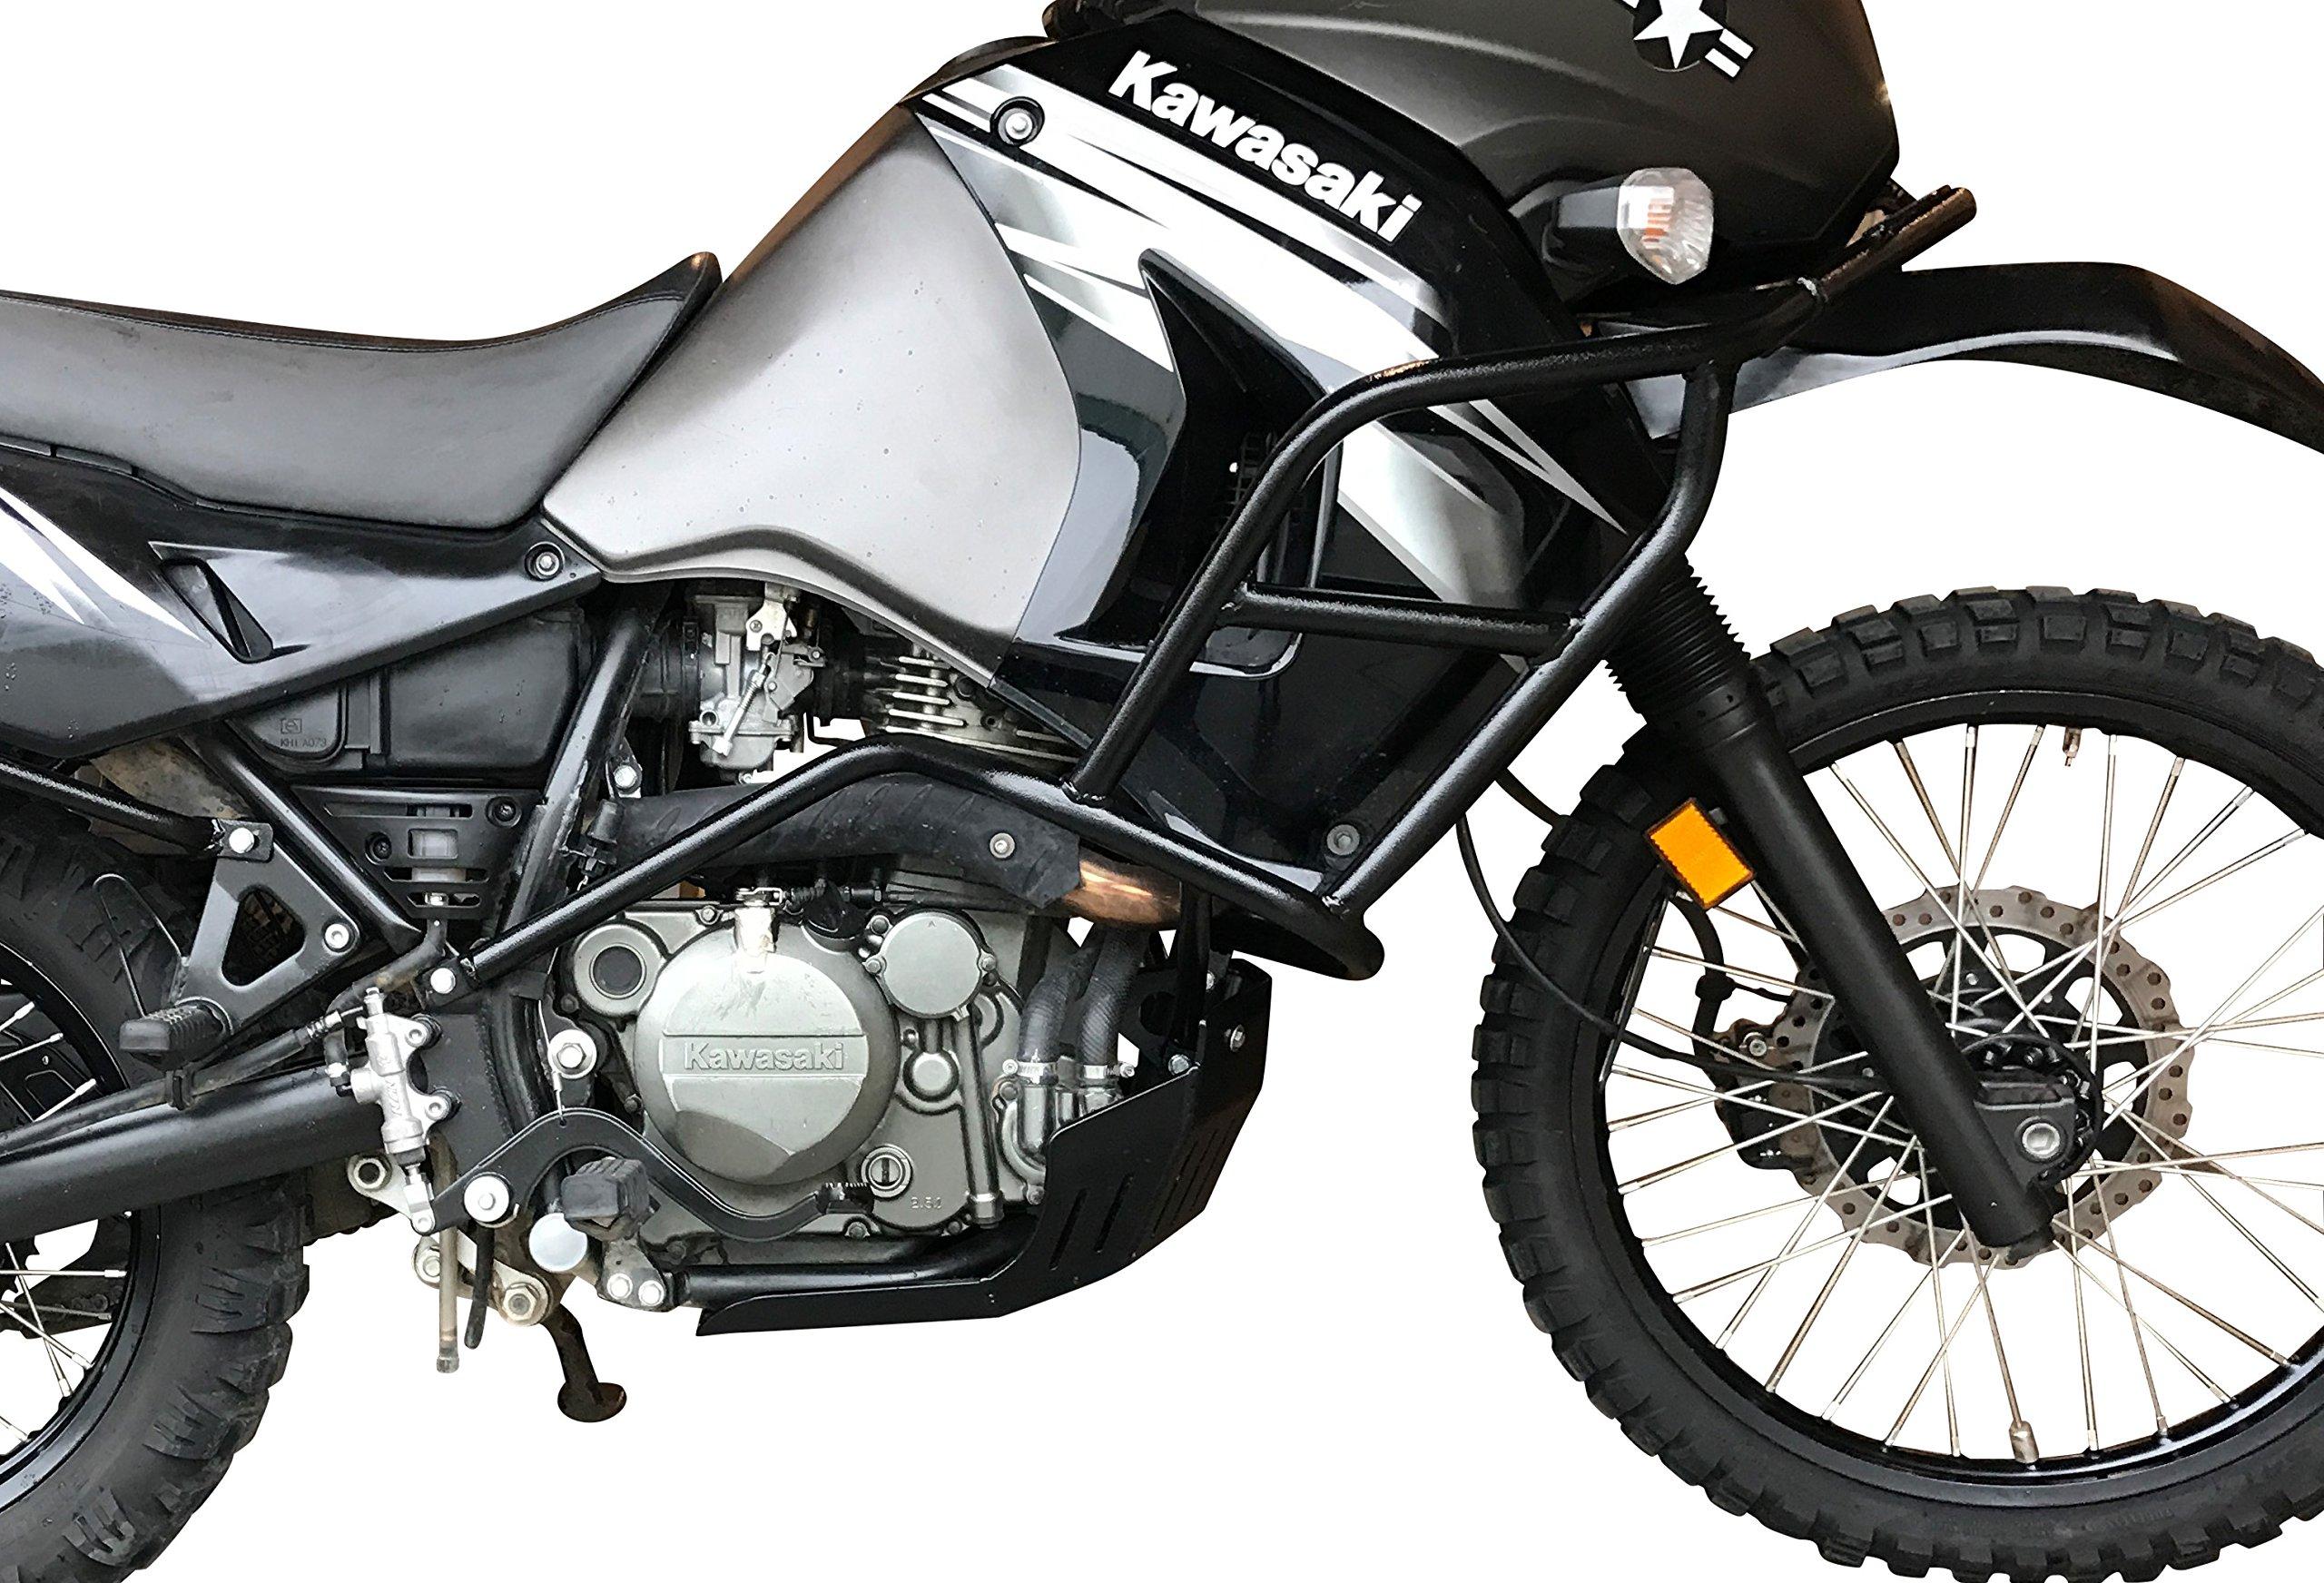 Kawasaki Klr650 Full Body Engine Crashbar 2008-2017